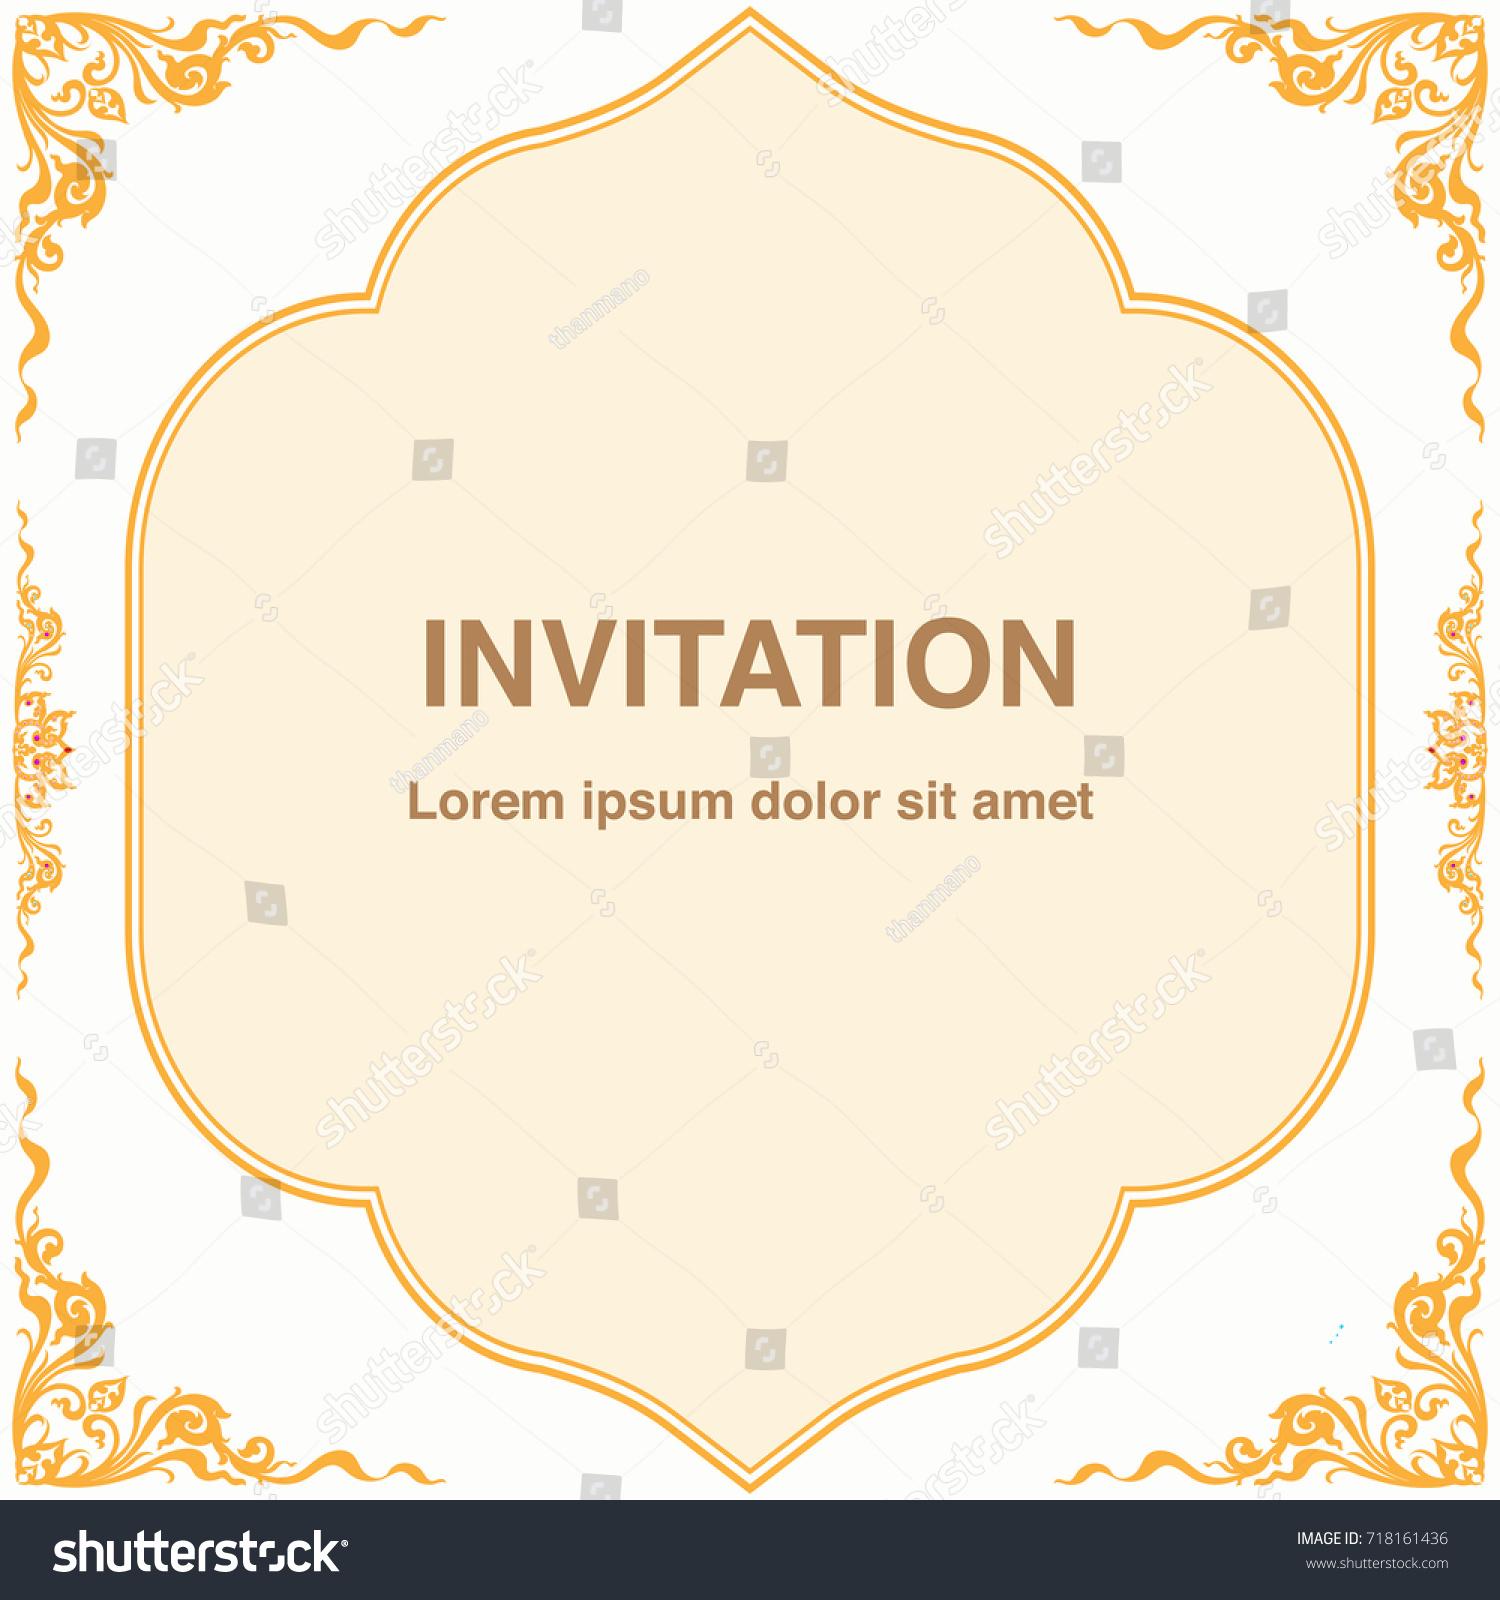 Invitation template frame border vector design stock vector invitation template frame and border vector design in thai style floral antique decorative illustration stopboris Image collections